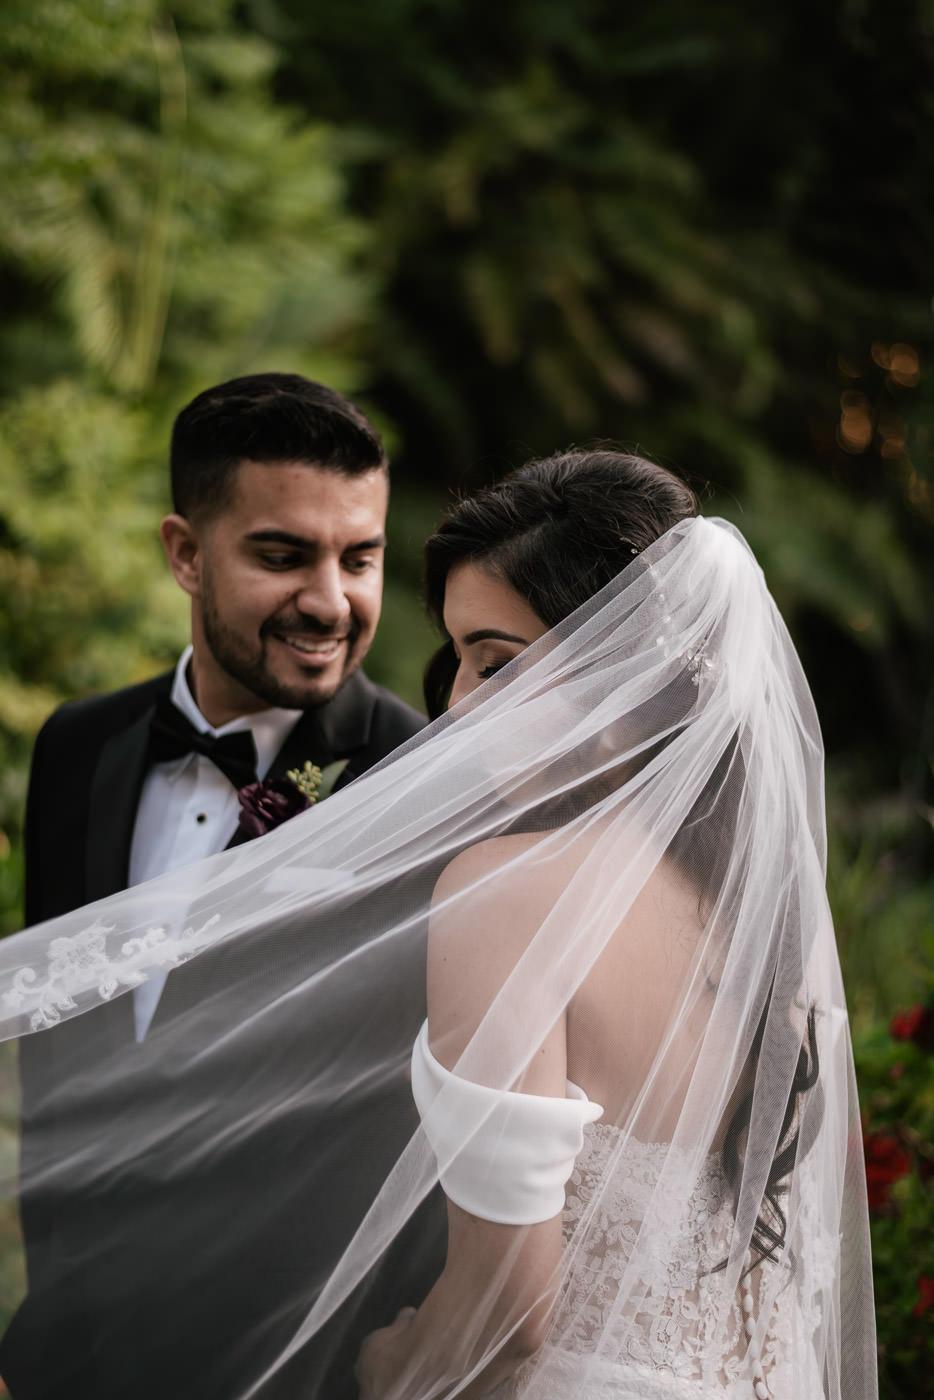 eden-gardens-wedding-photographer-romantic-73.jpg